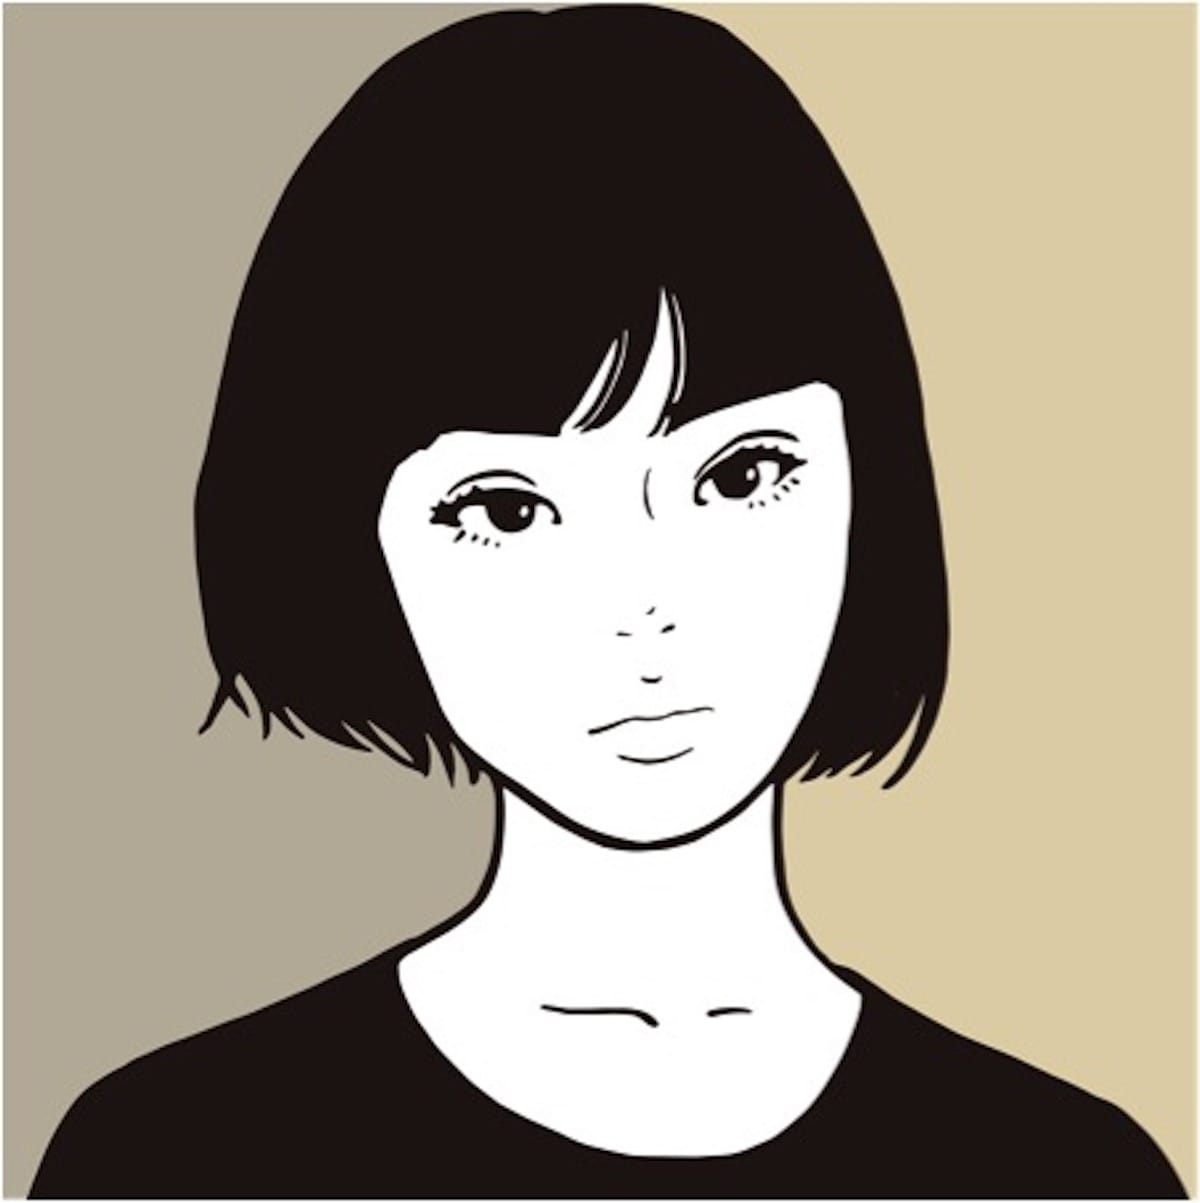 KyneがAWAでプレイリストを公開。Kyneにとっての音楽と絵の関係性とは? music180313-kyne-3-1200x1203